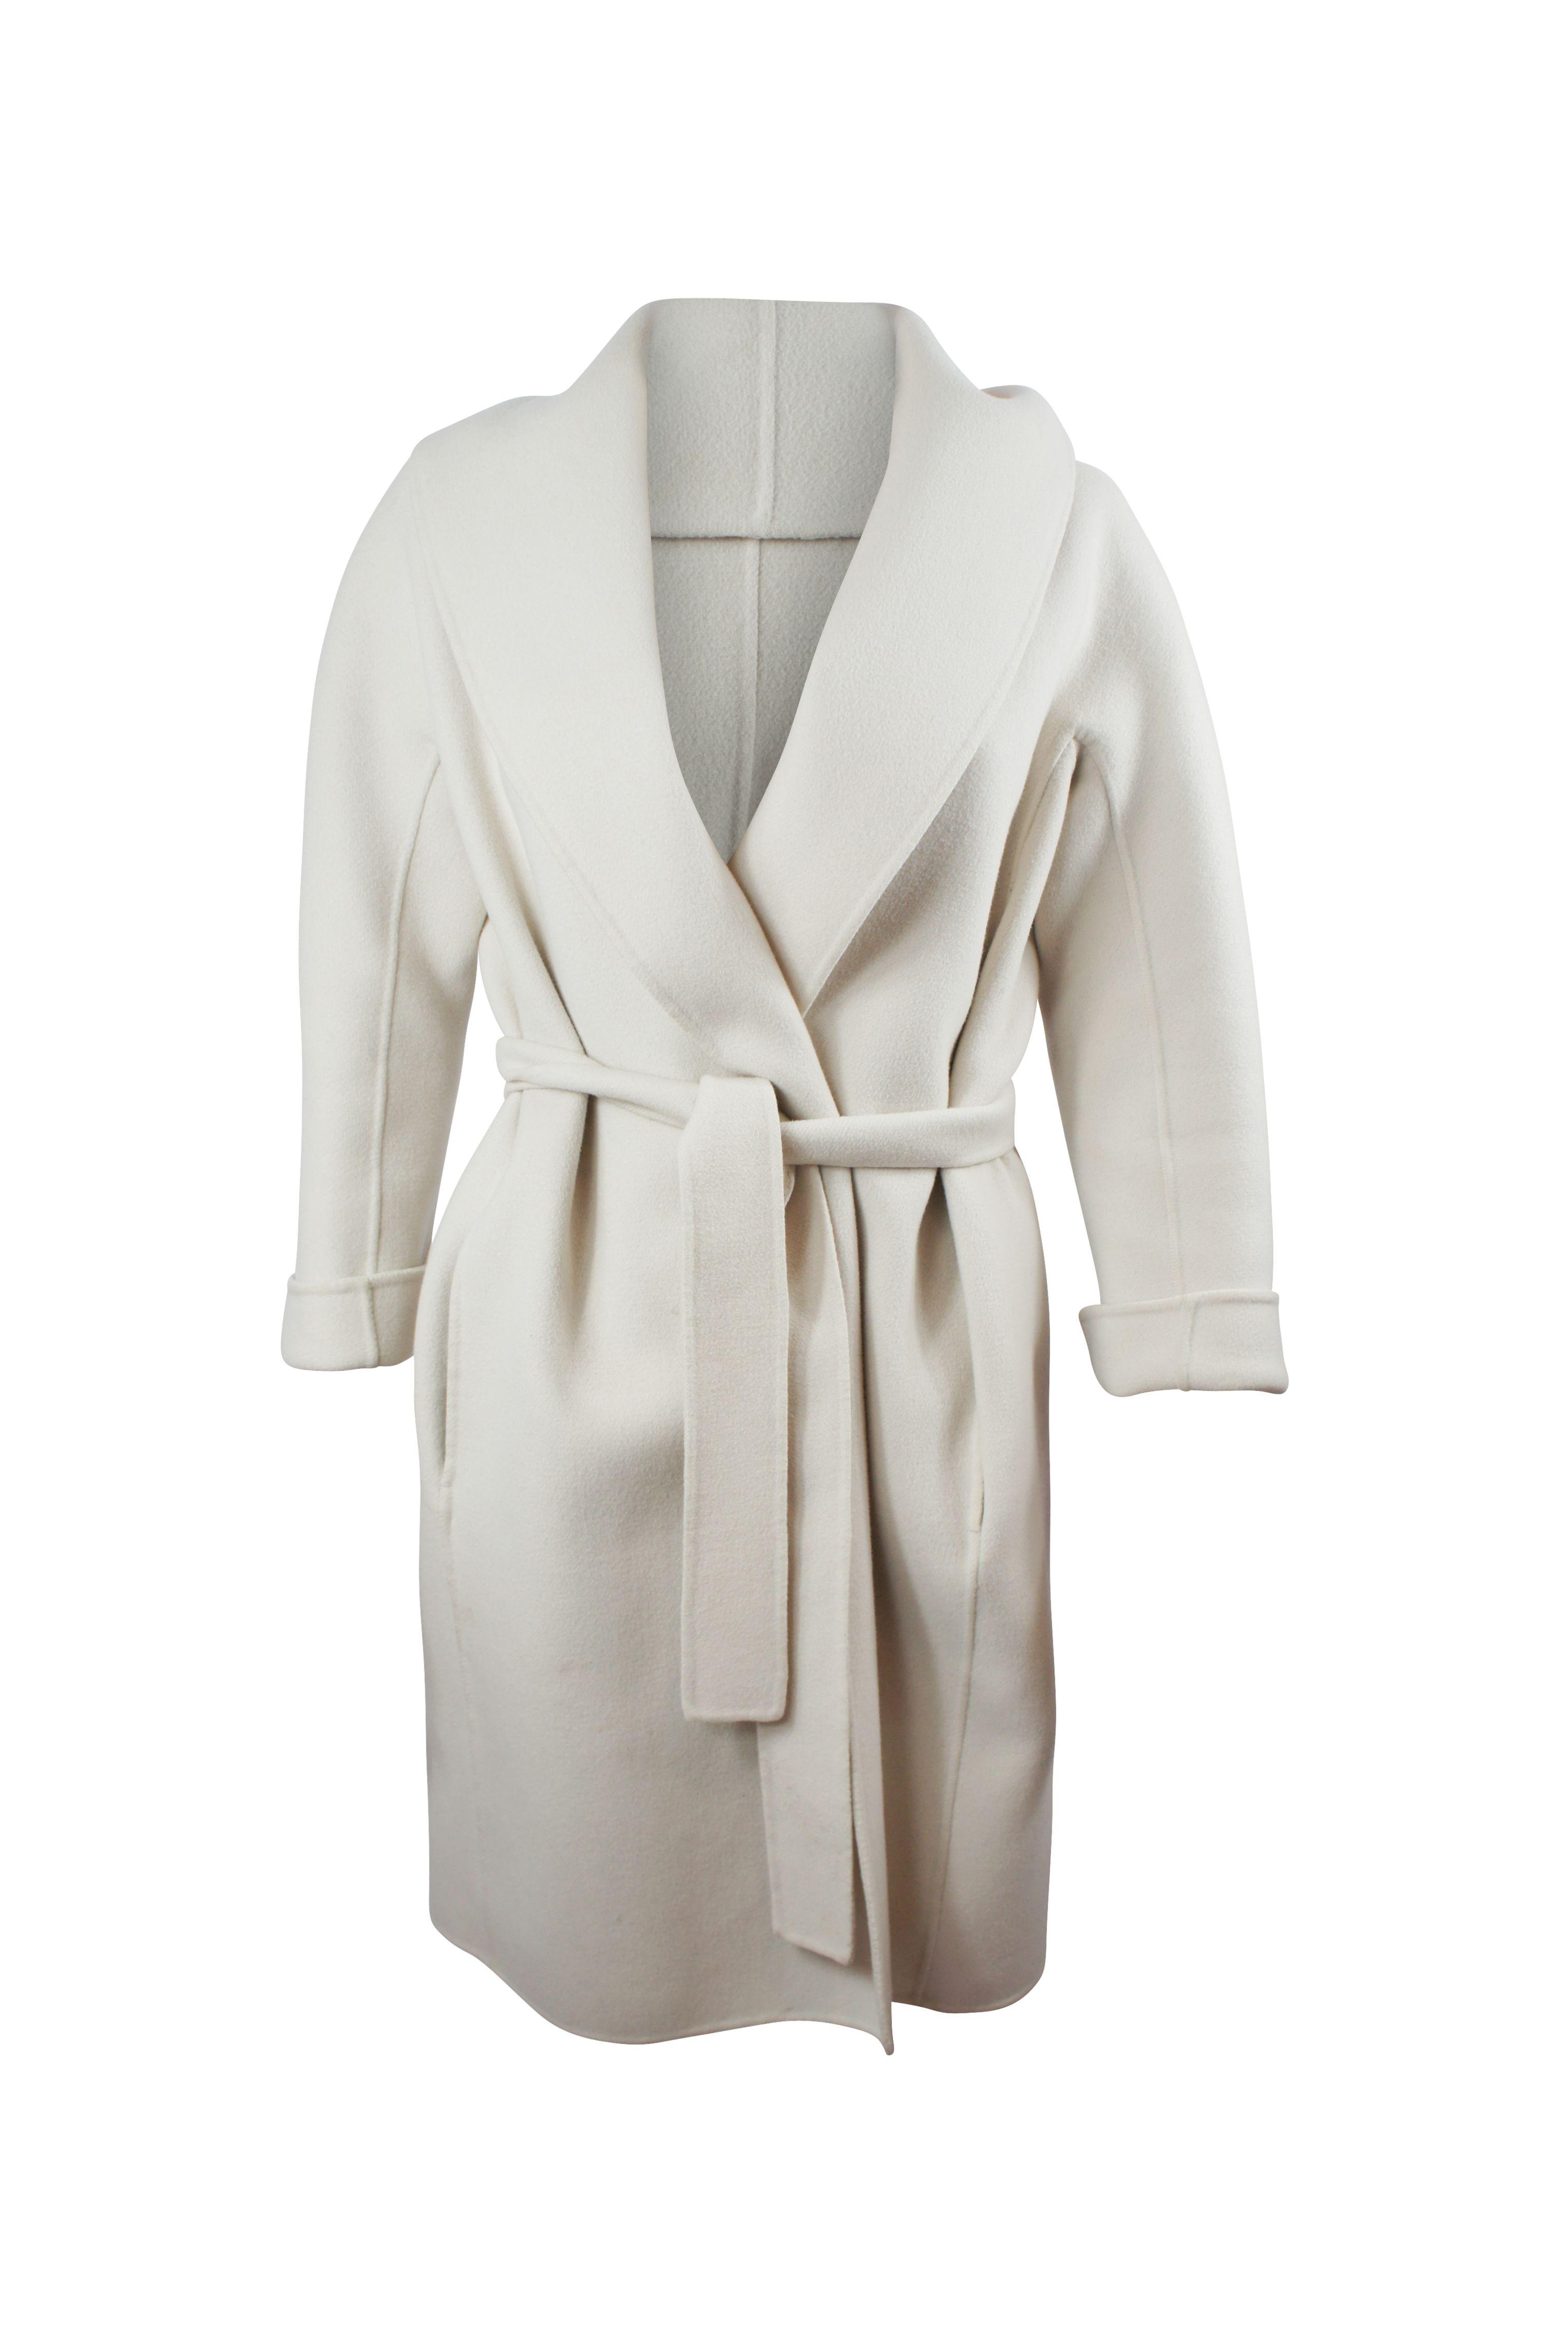 Max Mara Cream Coat 4 Preview Images